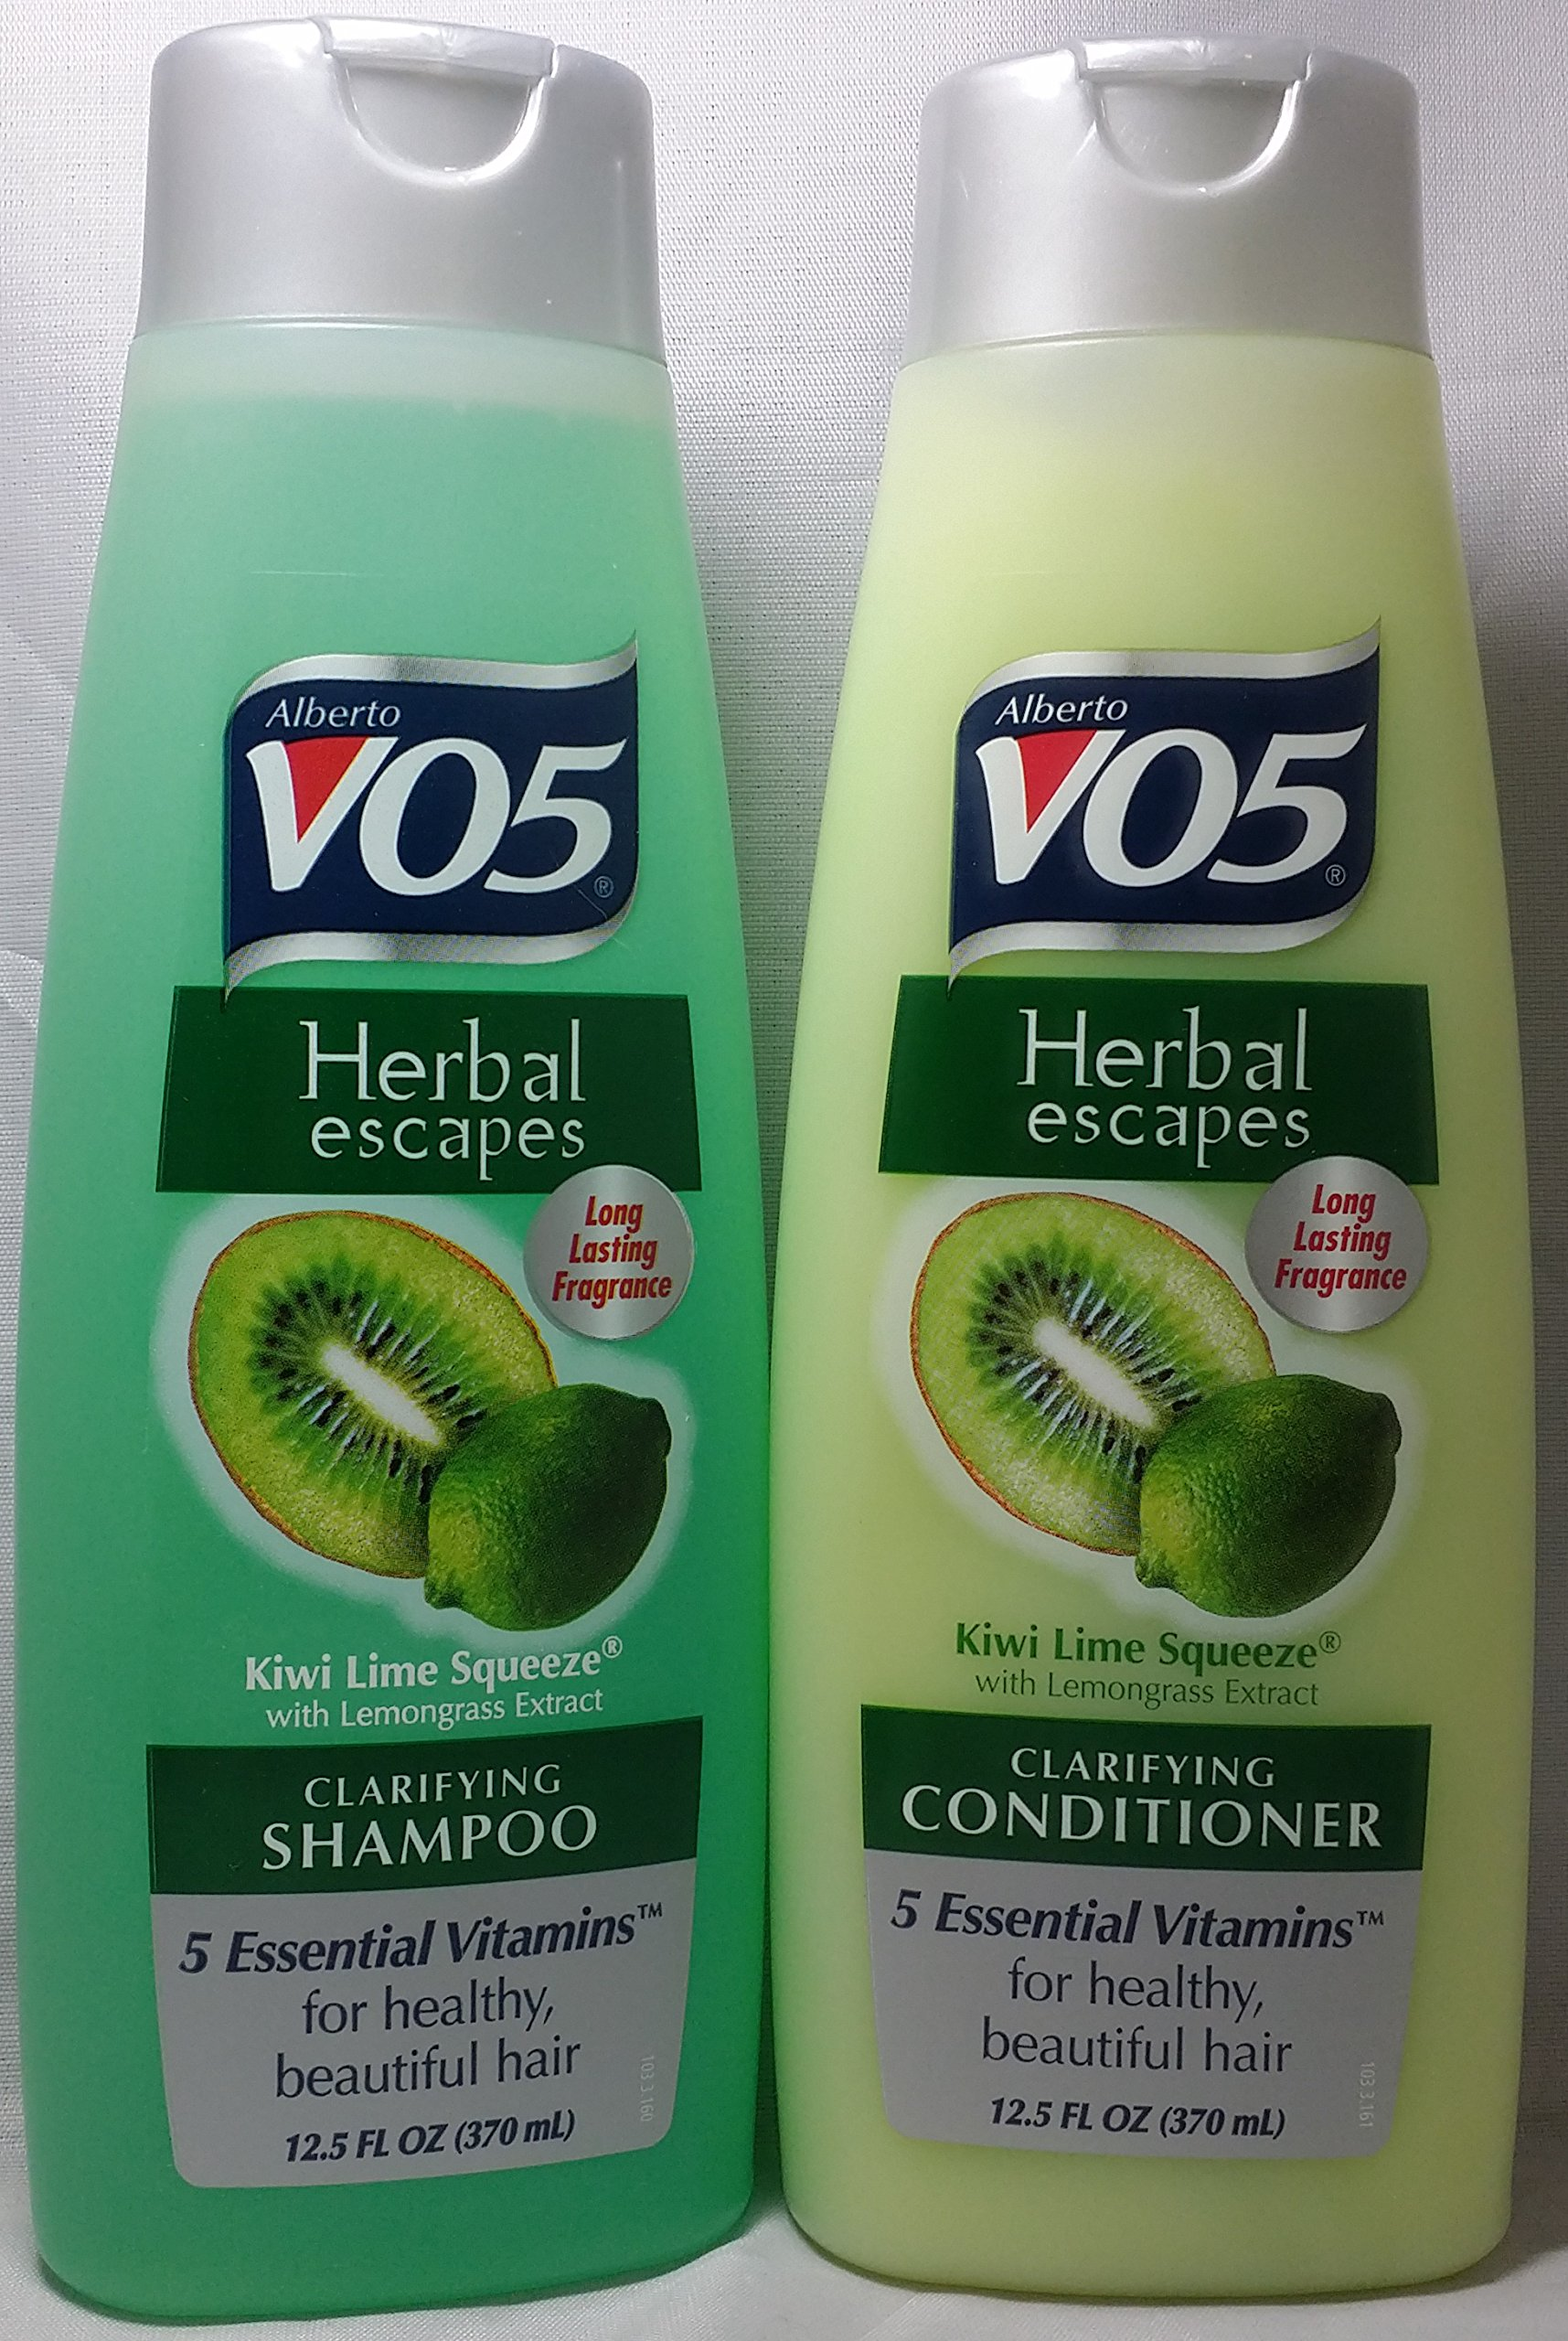 VO5 Herbal Escapes Kiwi Lime Squeeze Shampoo & Conditioner (12.5 Oz)